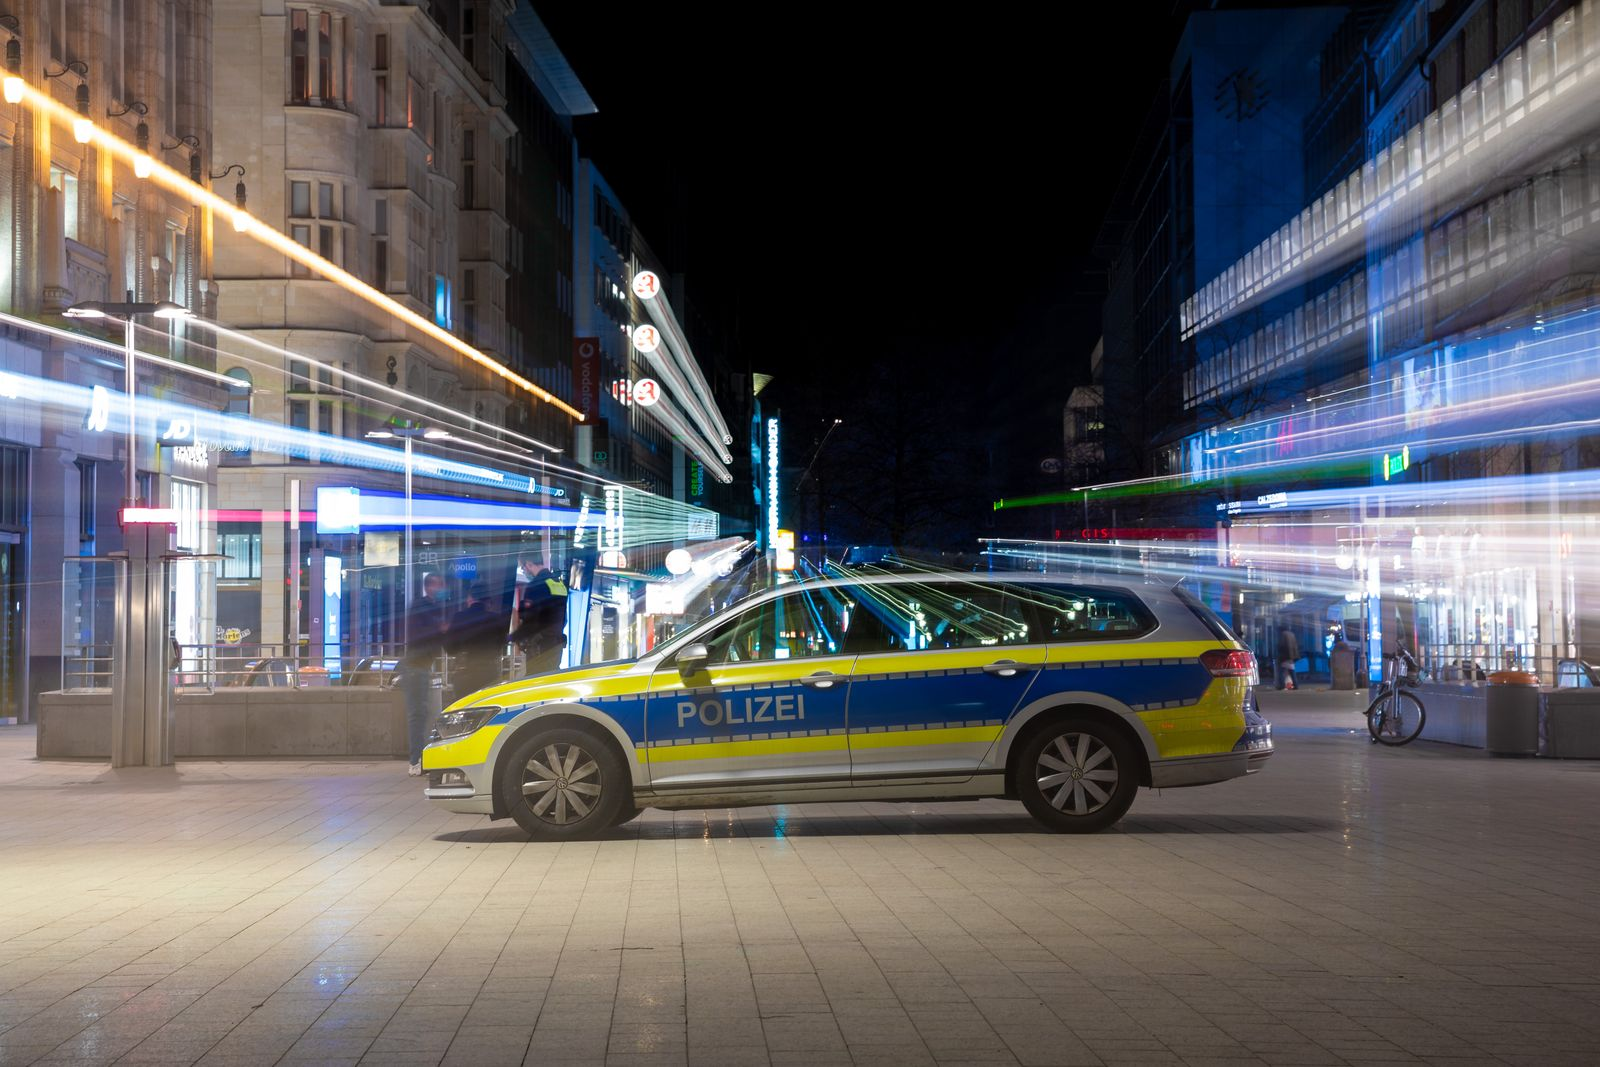 Coronavirus - Ausgangssperre in Region Hannover begonnen